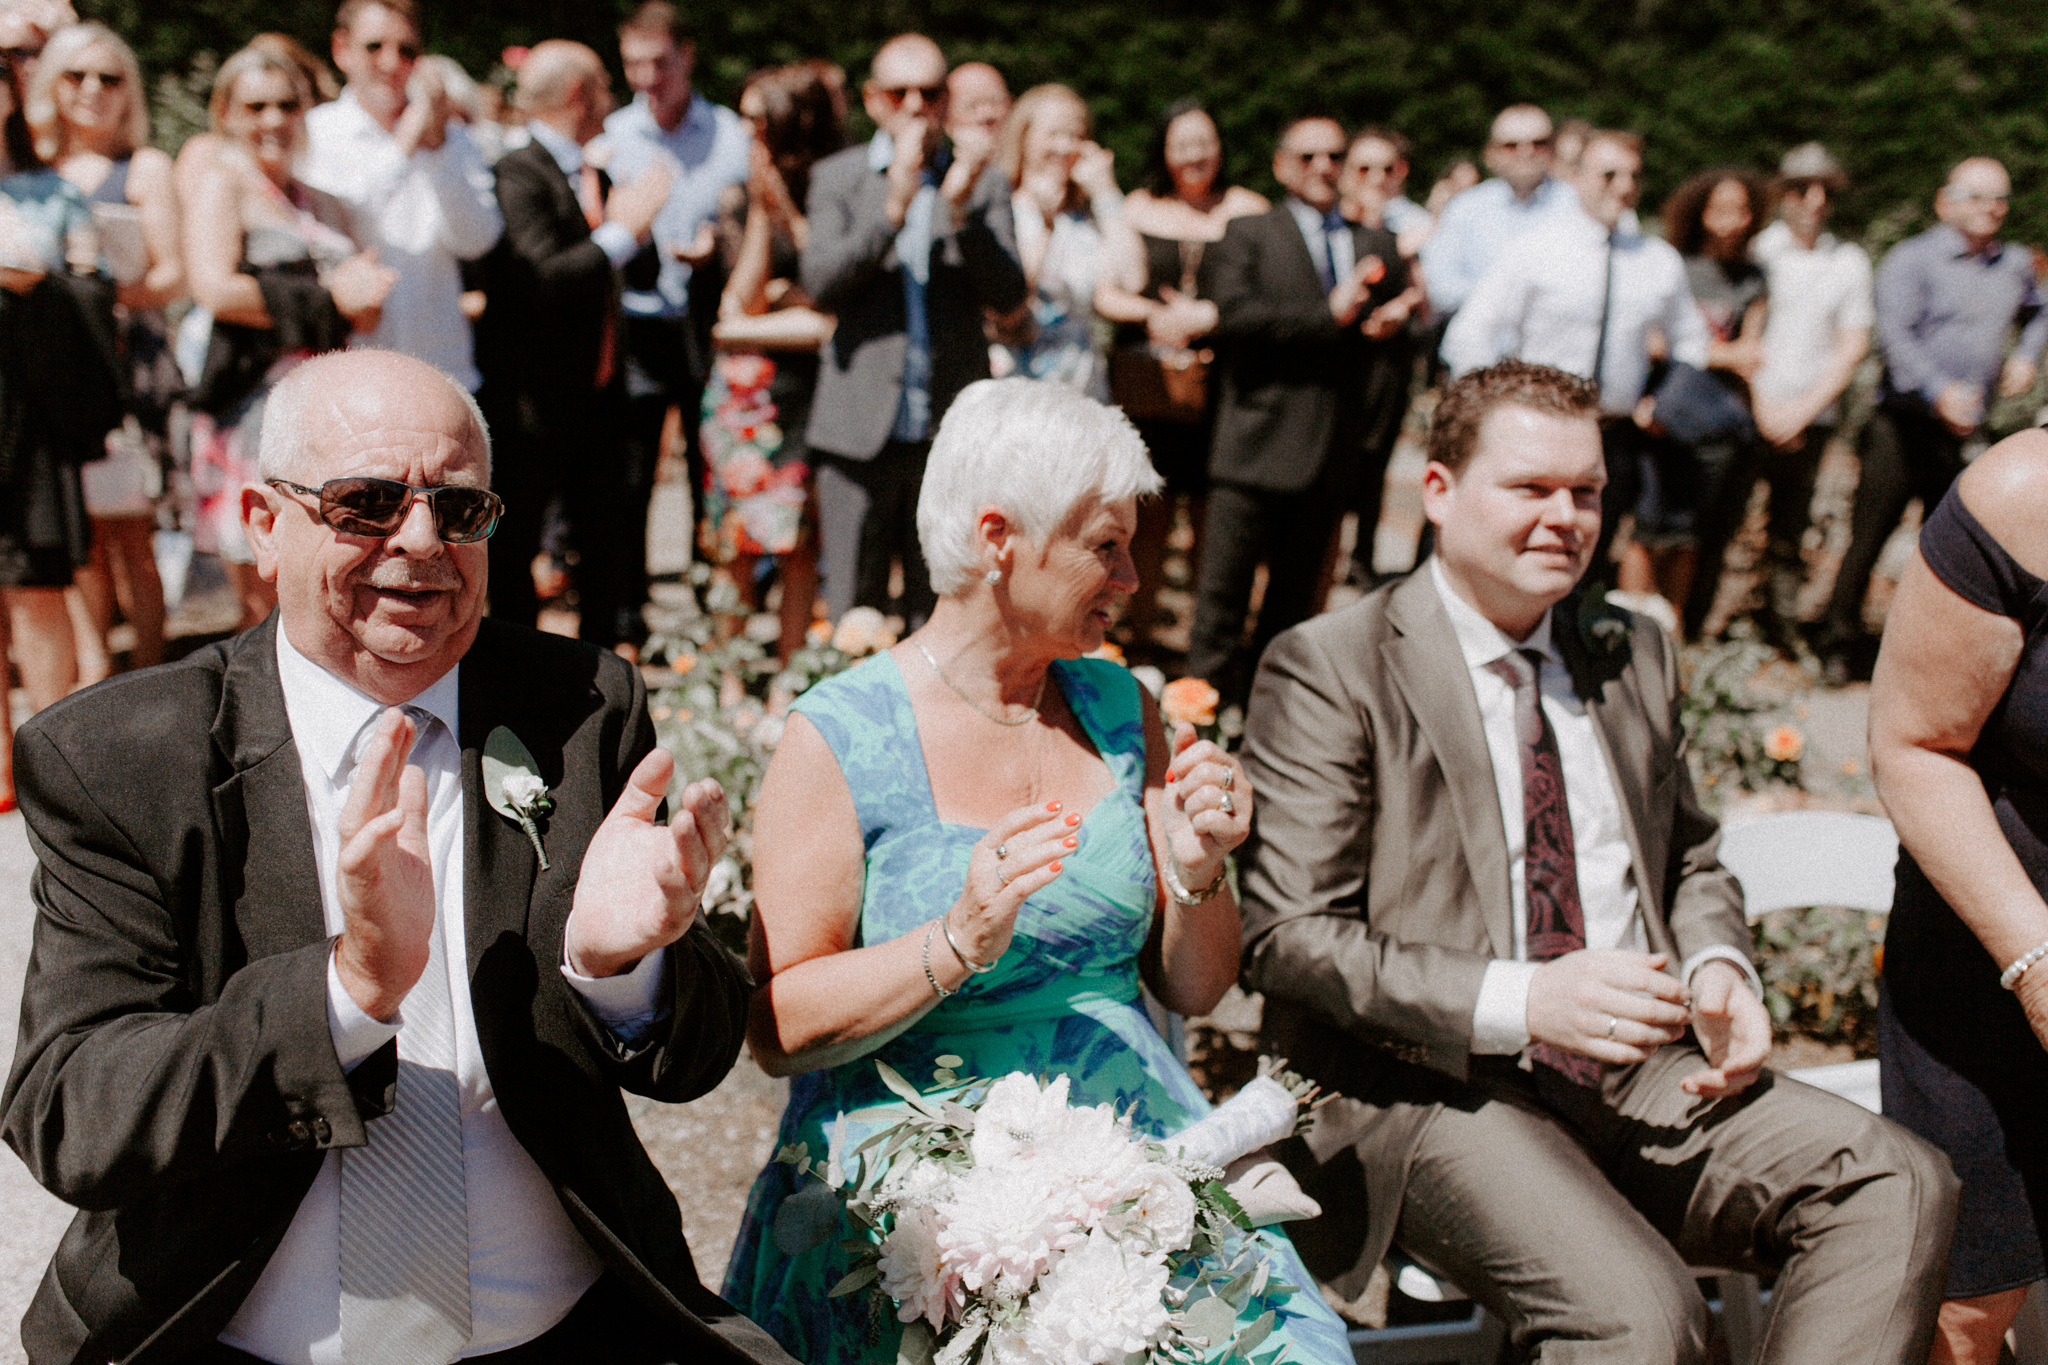 St-Kilda-Garden-Wedding-Emotions-and-Math-Photograph-060.jpg